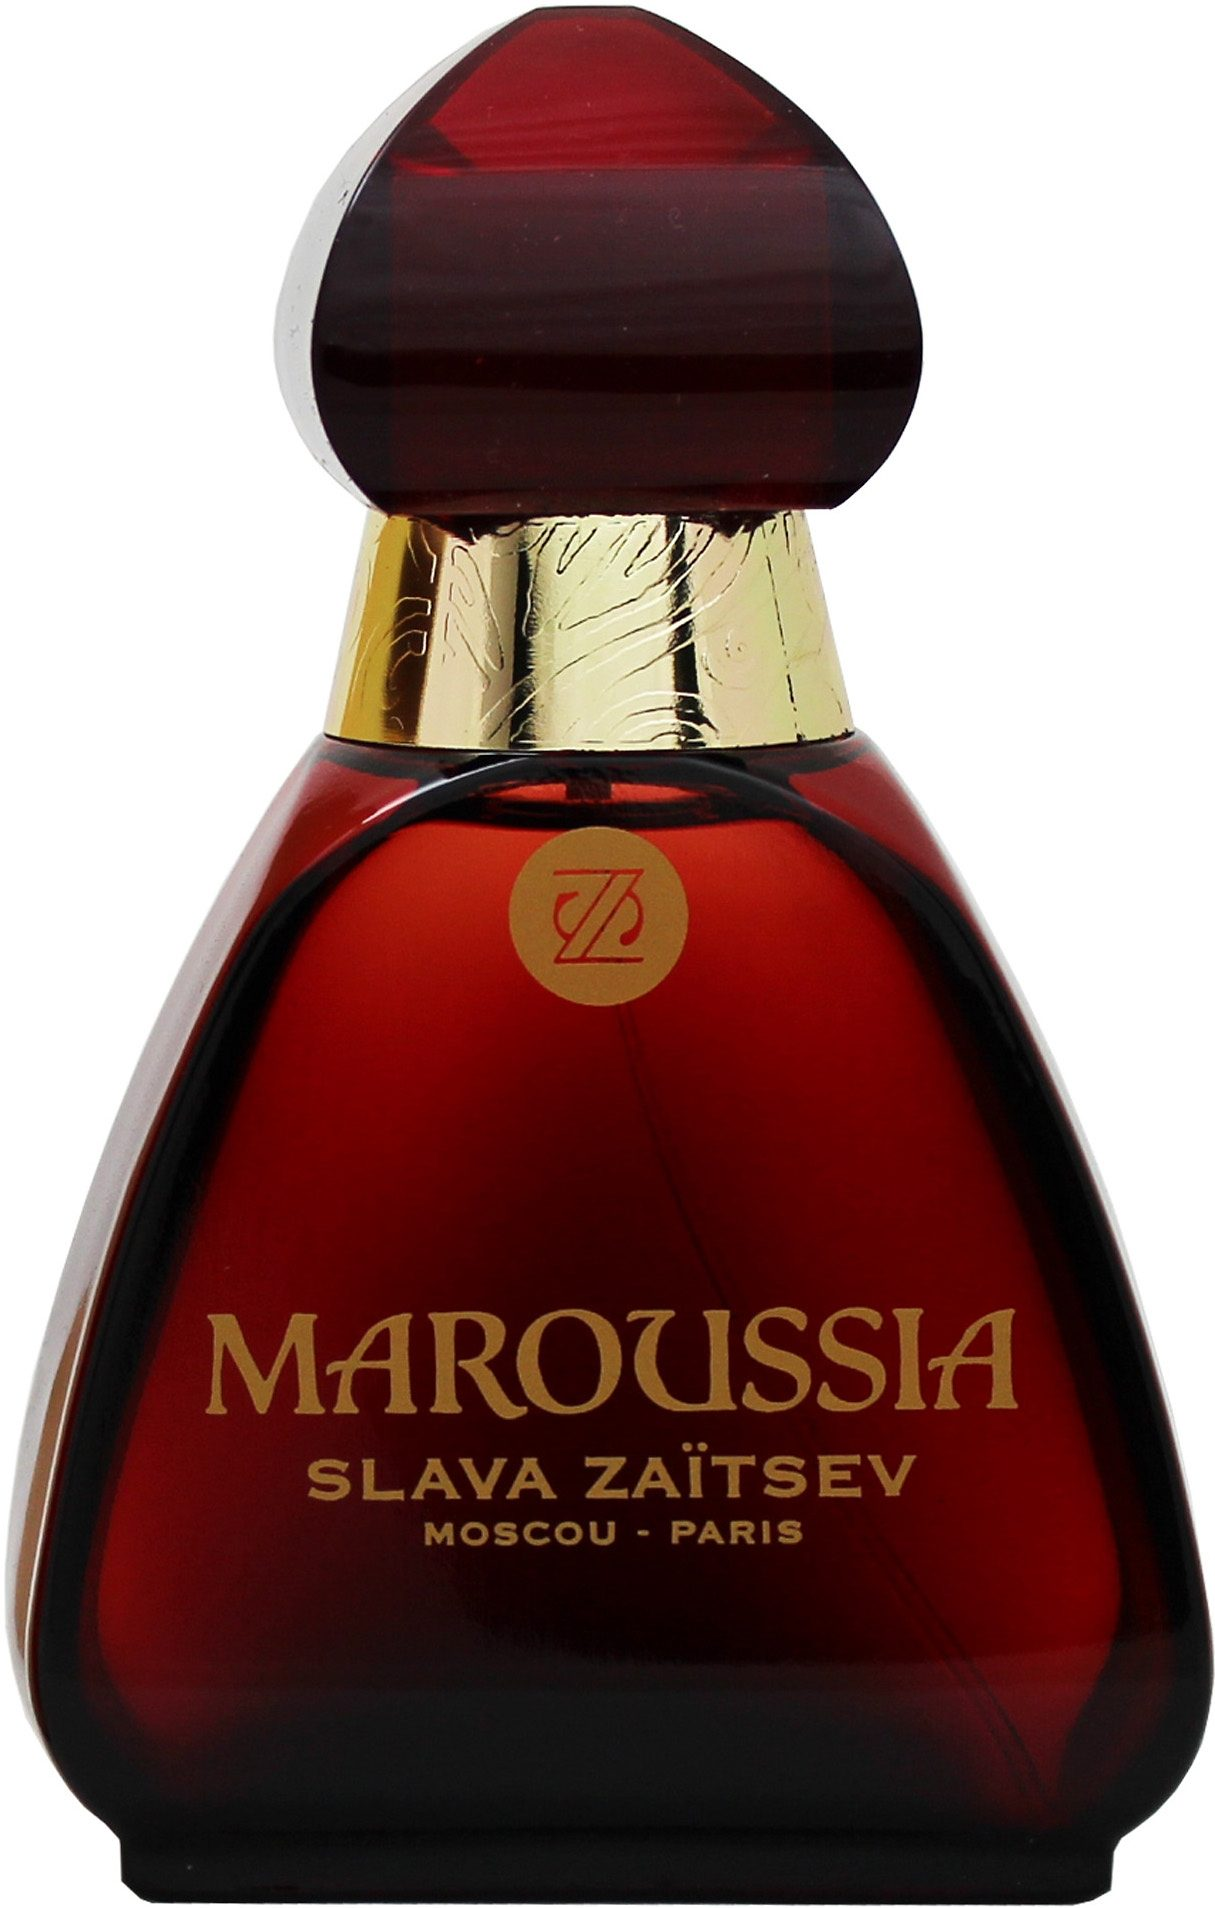 Slava Zaitsev, »Maroussia«, Eau de Toilette